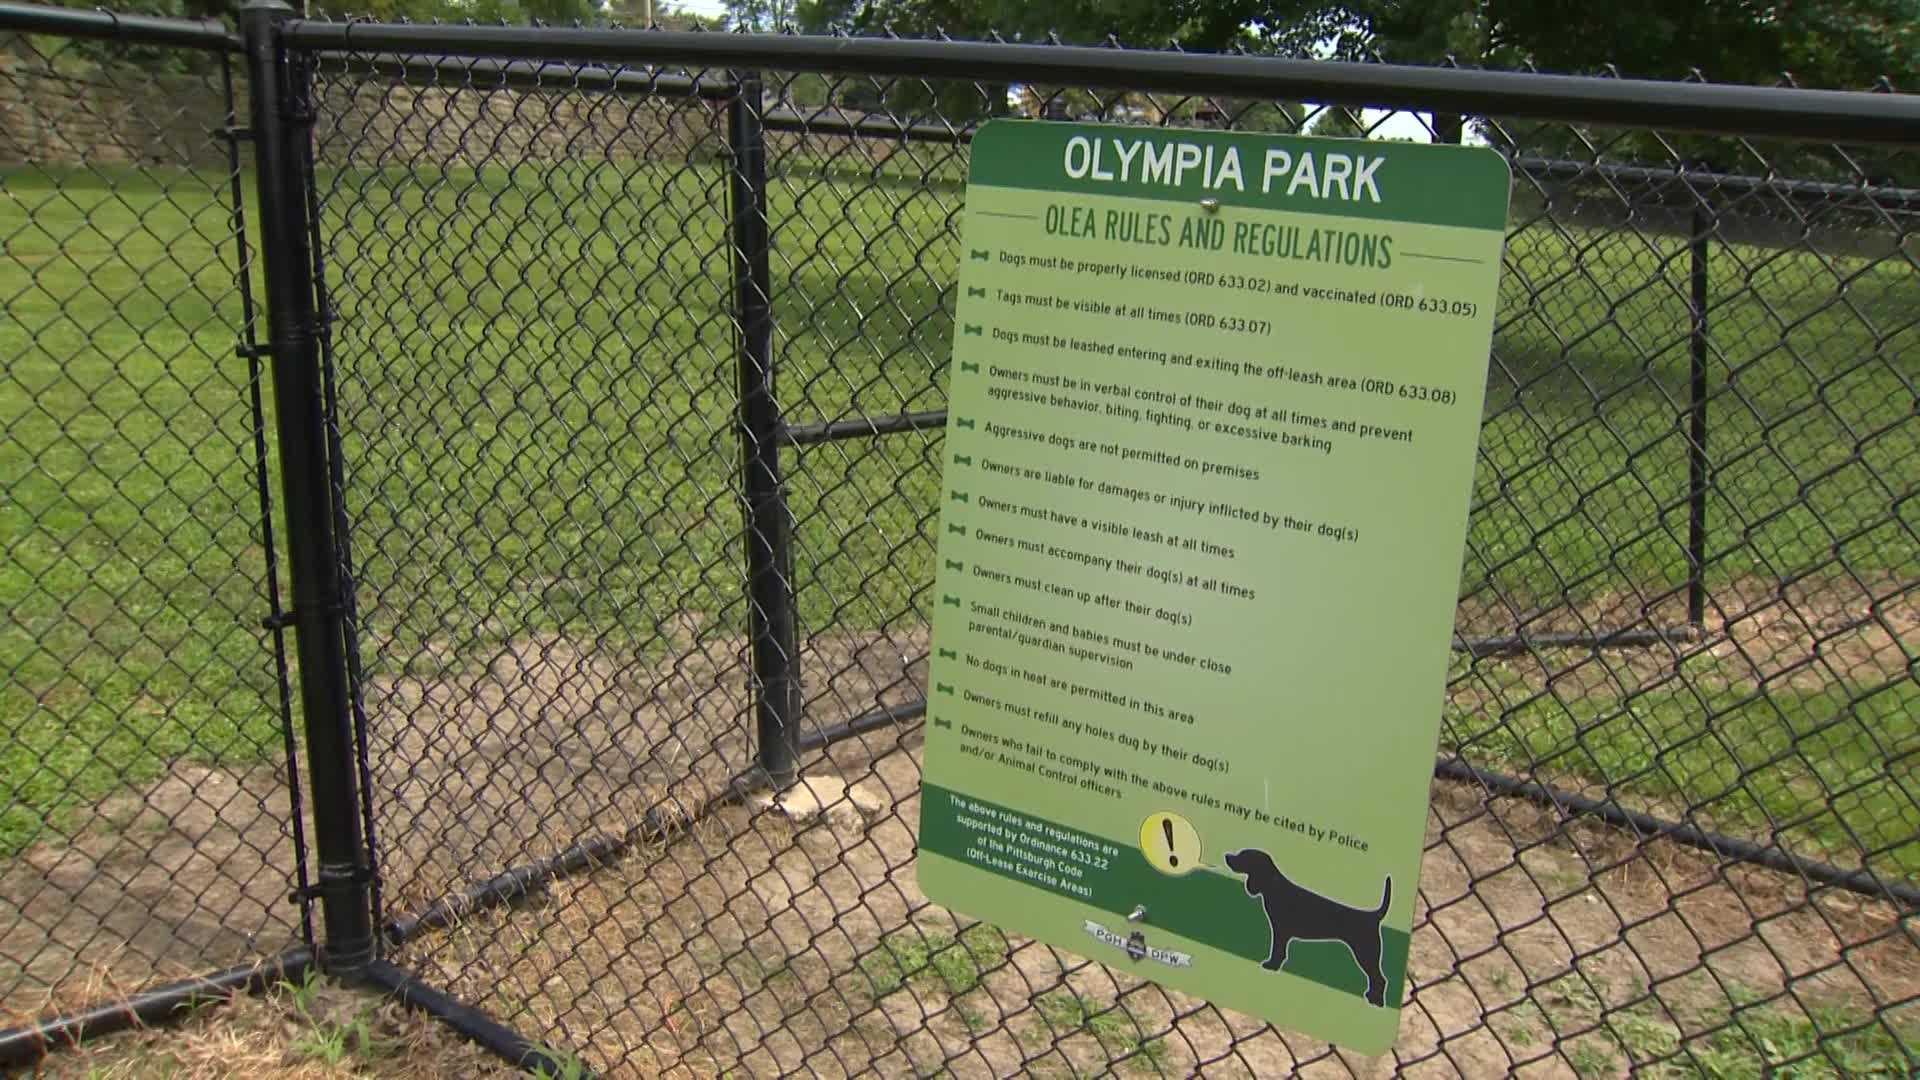 Olympia Park in Mt. Washington